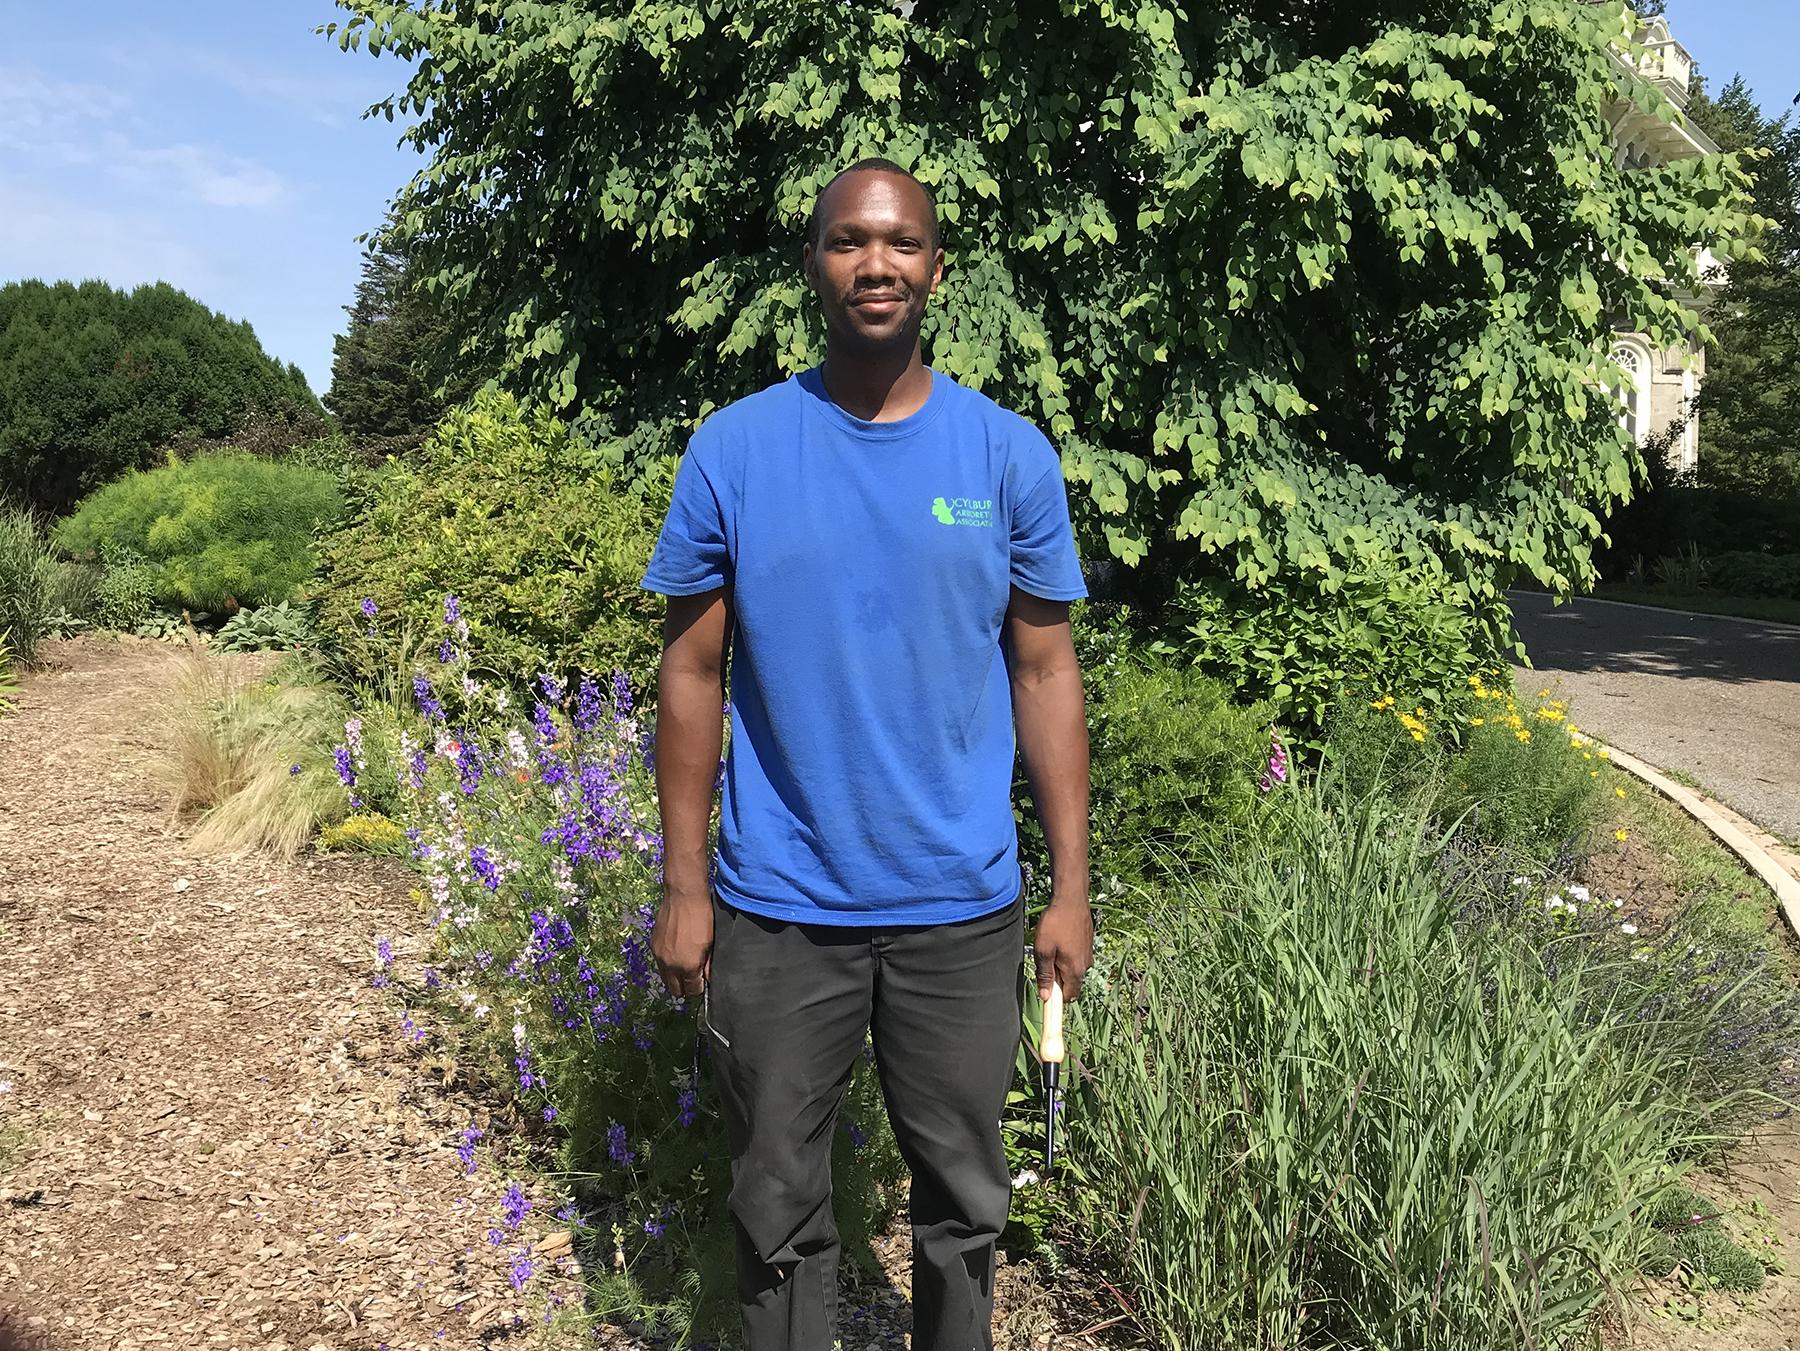 2018 Garden Intern for Cylburn Arboretum